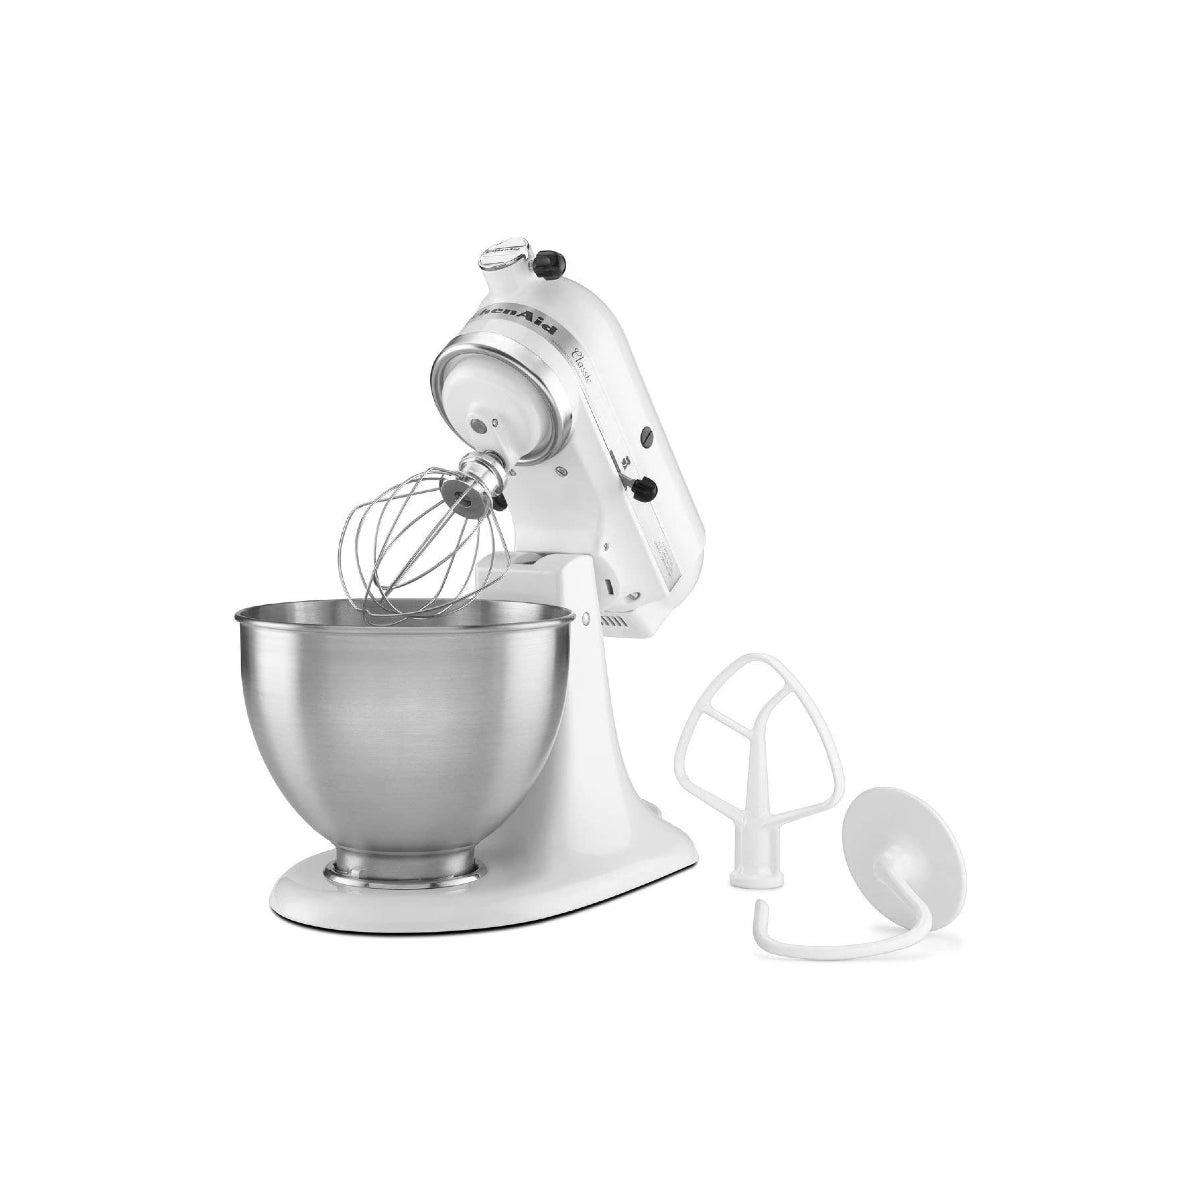 The-Best-KithcenAid-Mixer-Option-KitchenAid Classic